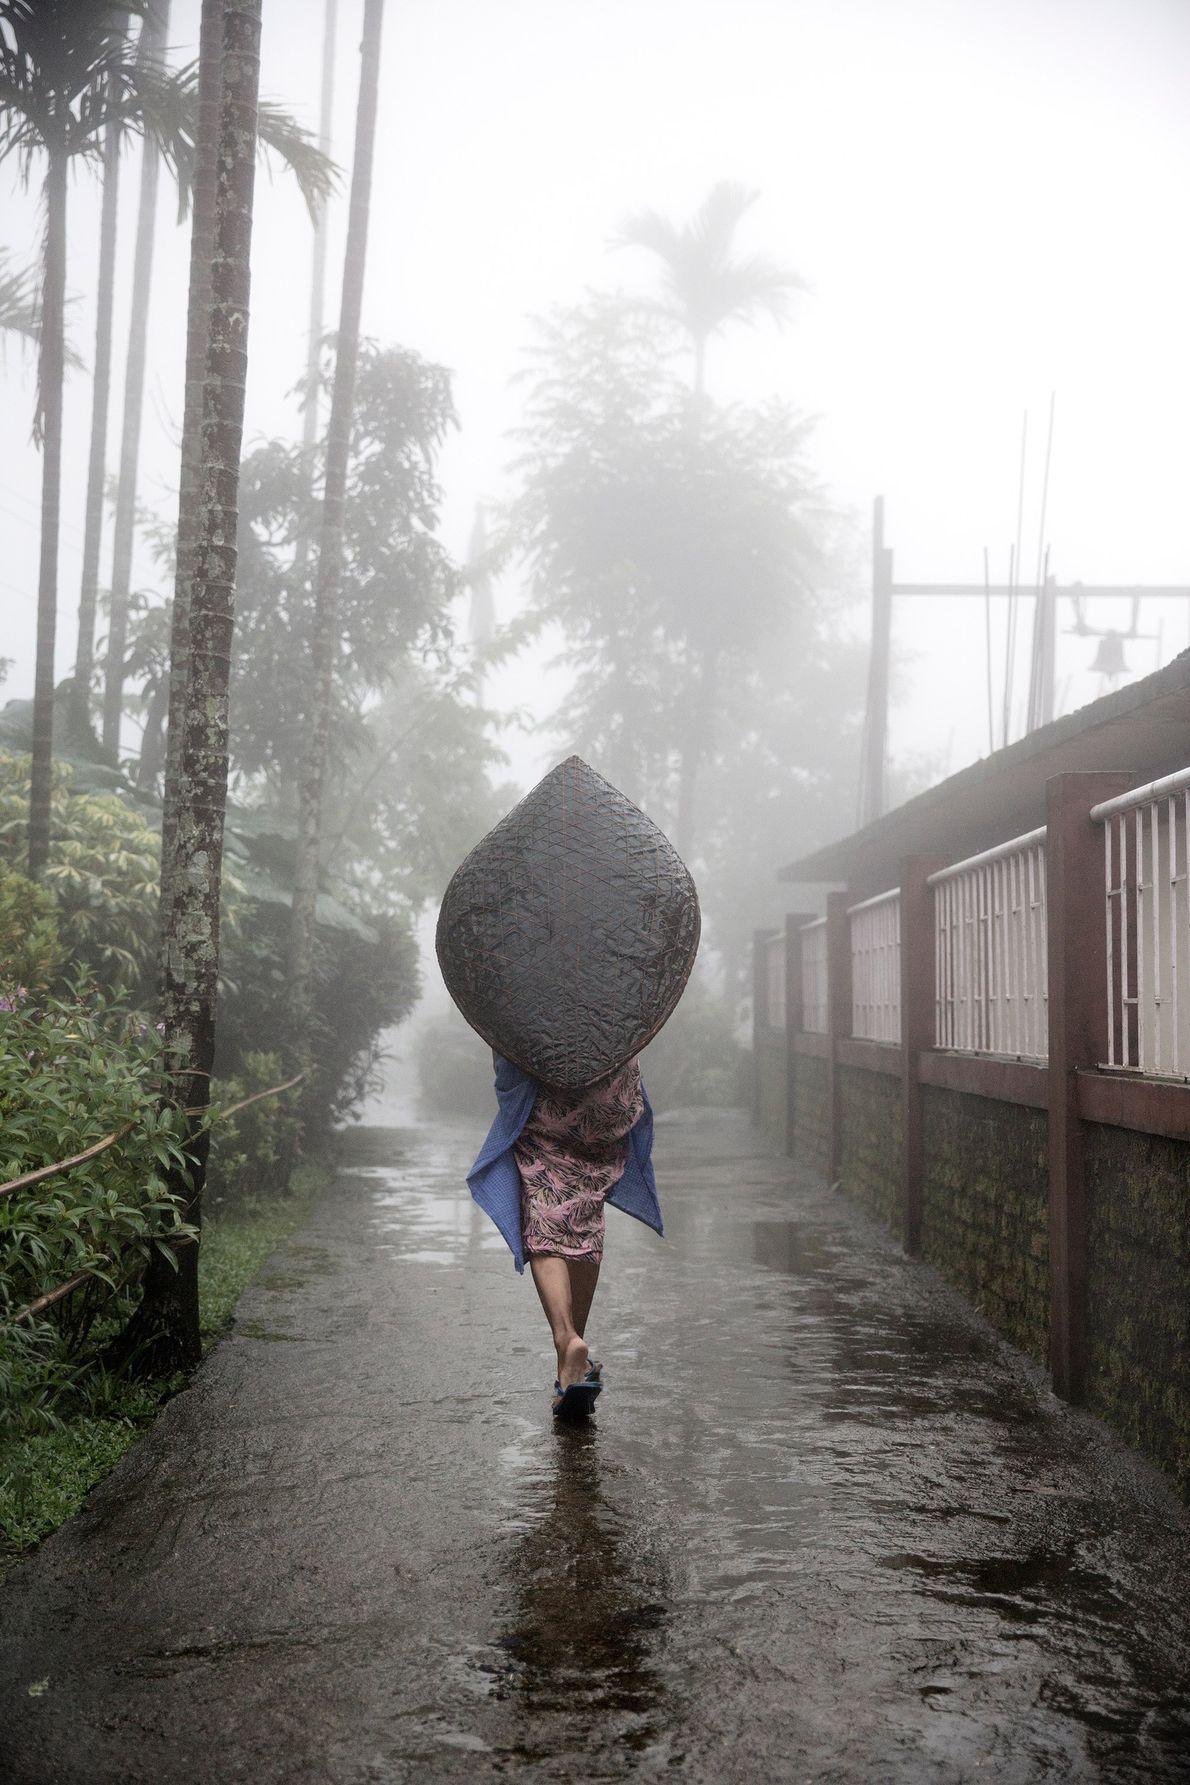 guarda-chuva-pontes-de-raizes-vivas-meghalaya-india